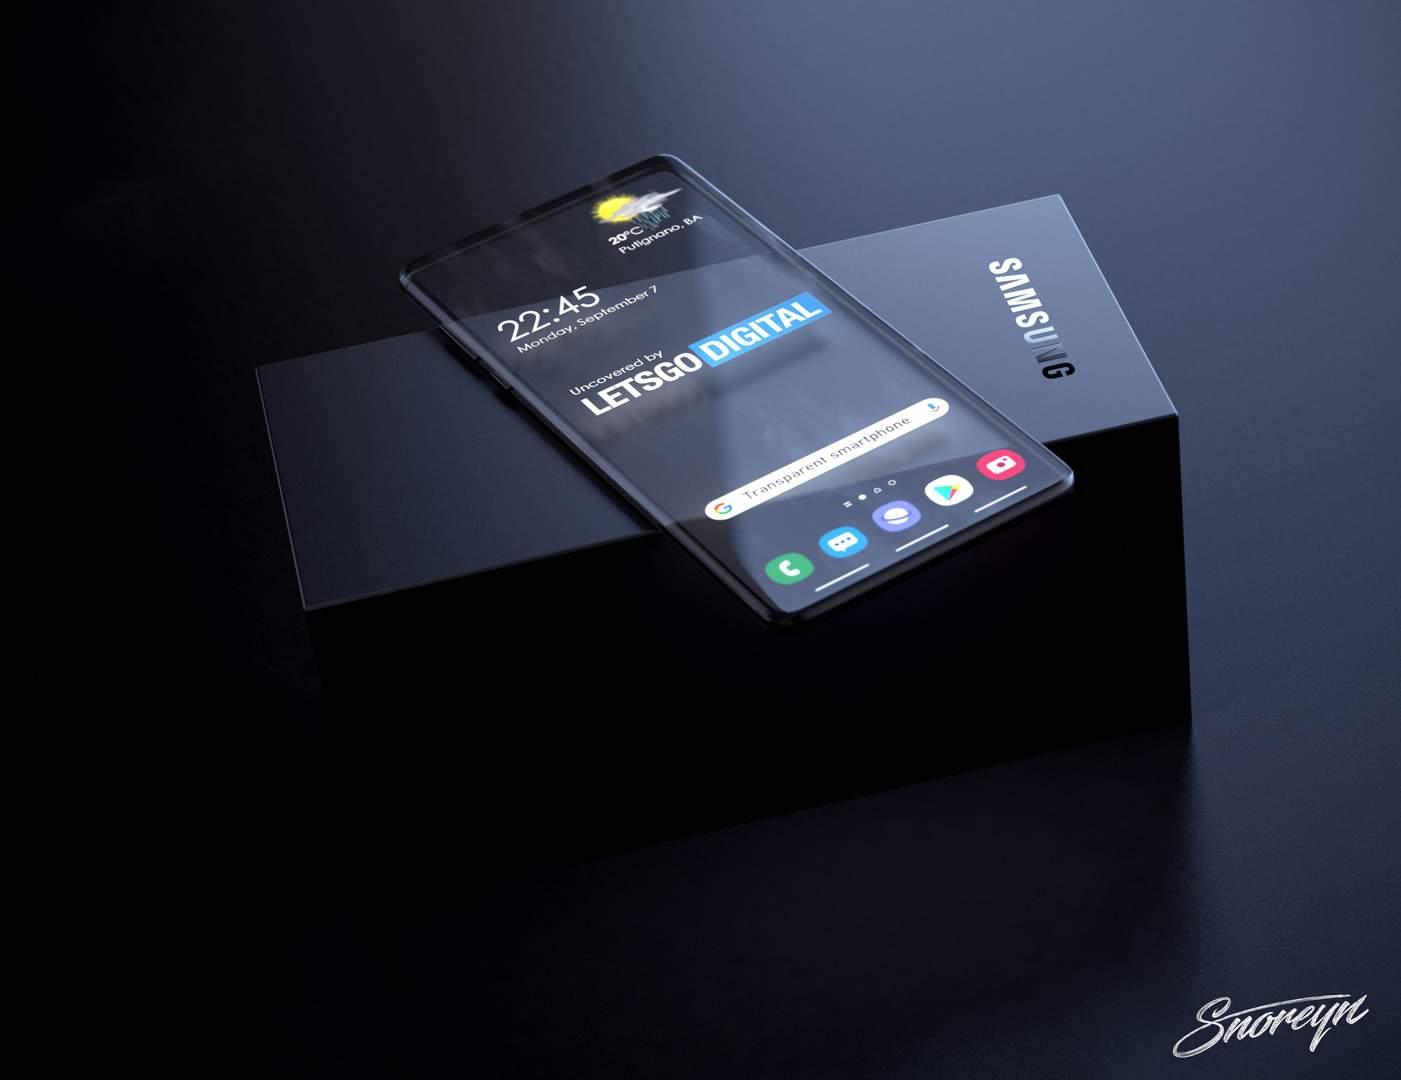 Samsung transparent smartphone Letsgodigital image 3